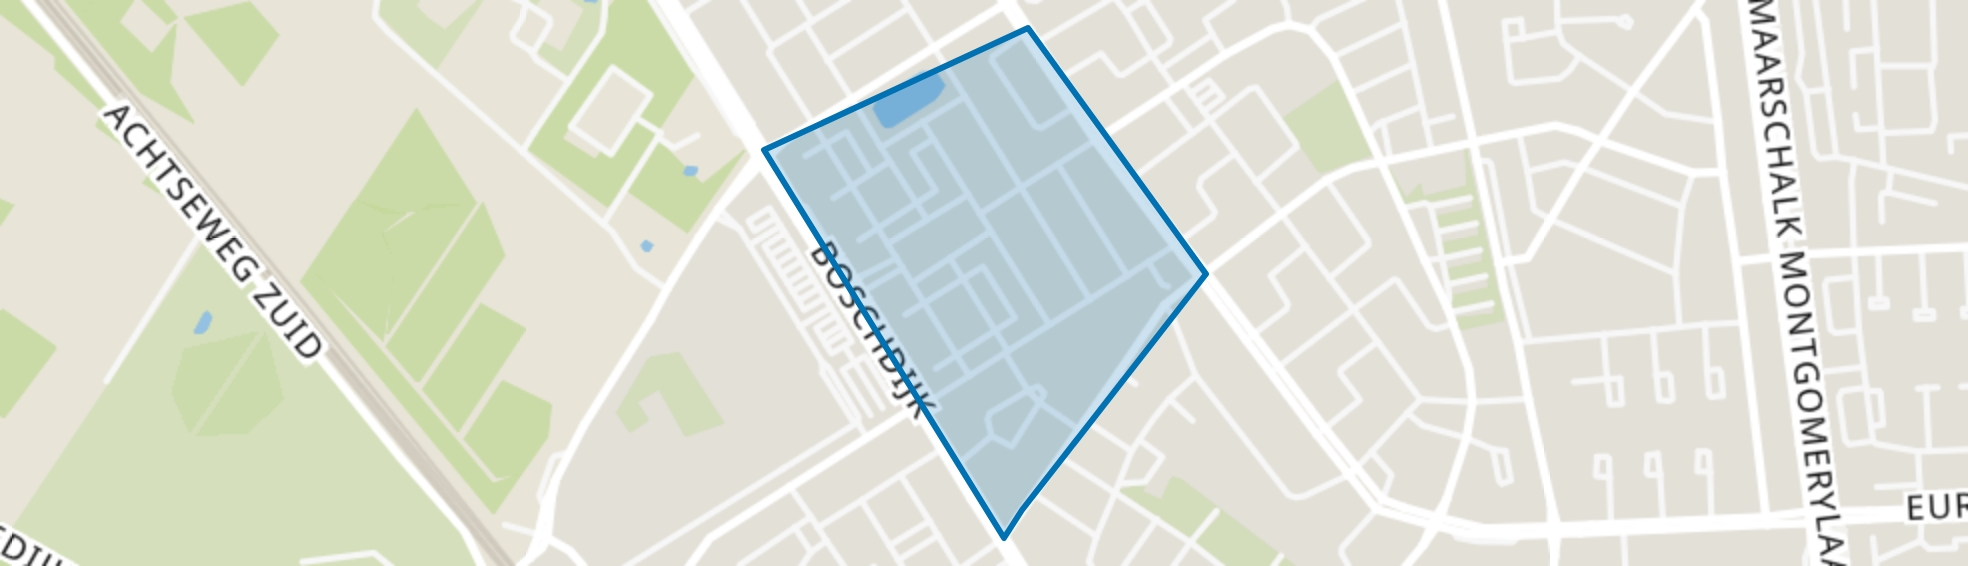 Barrier, Eindhoven map